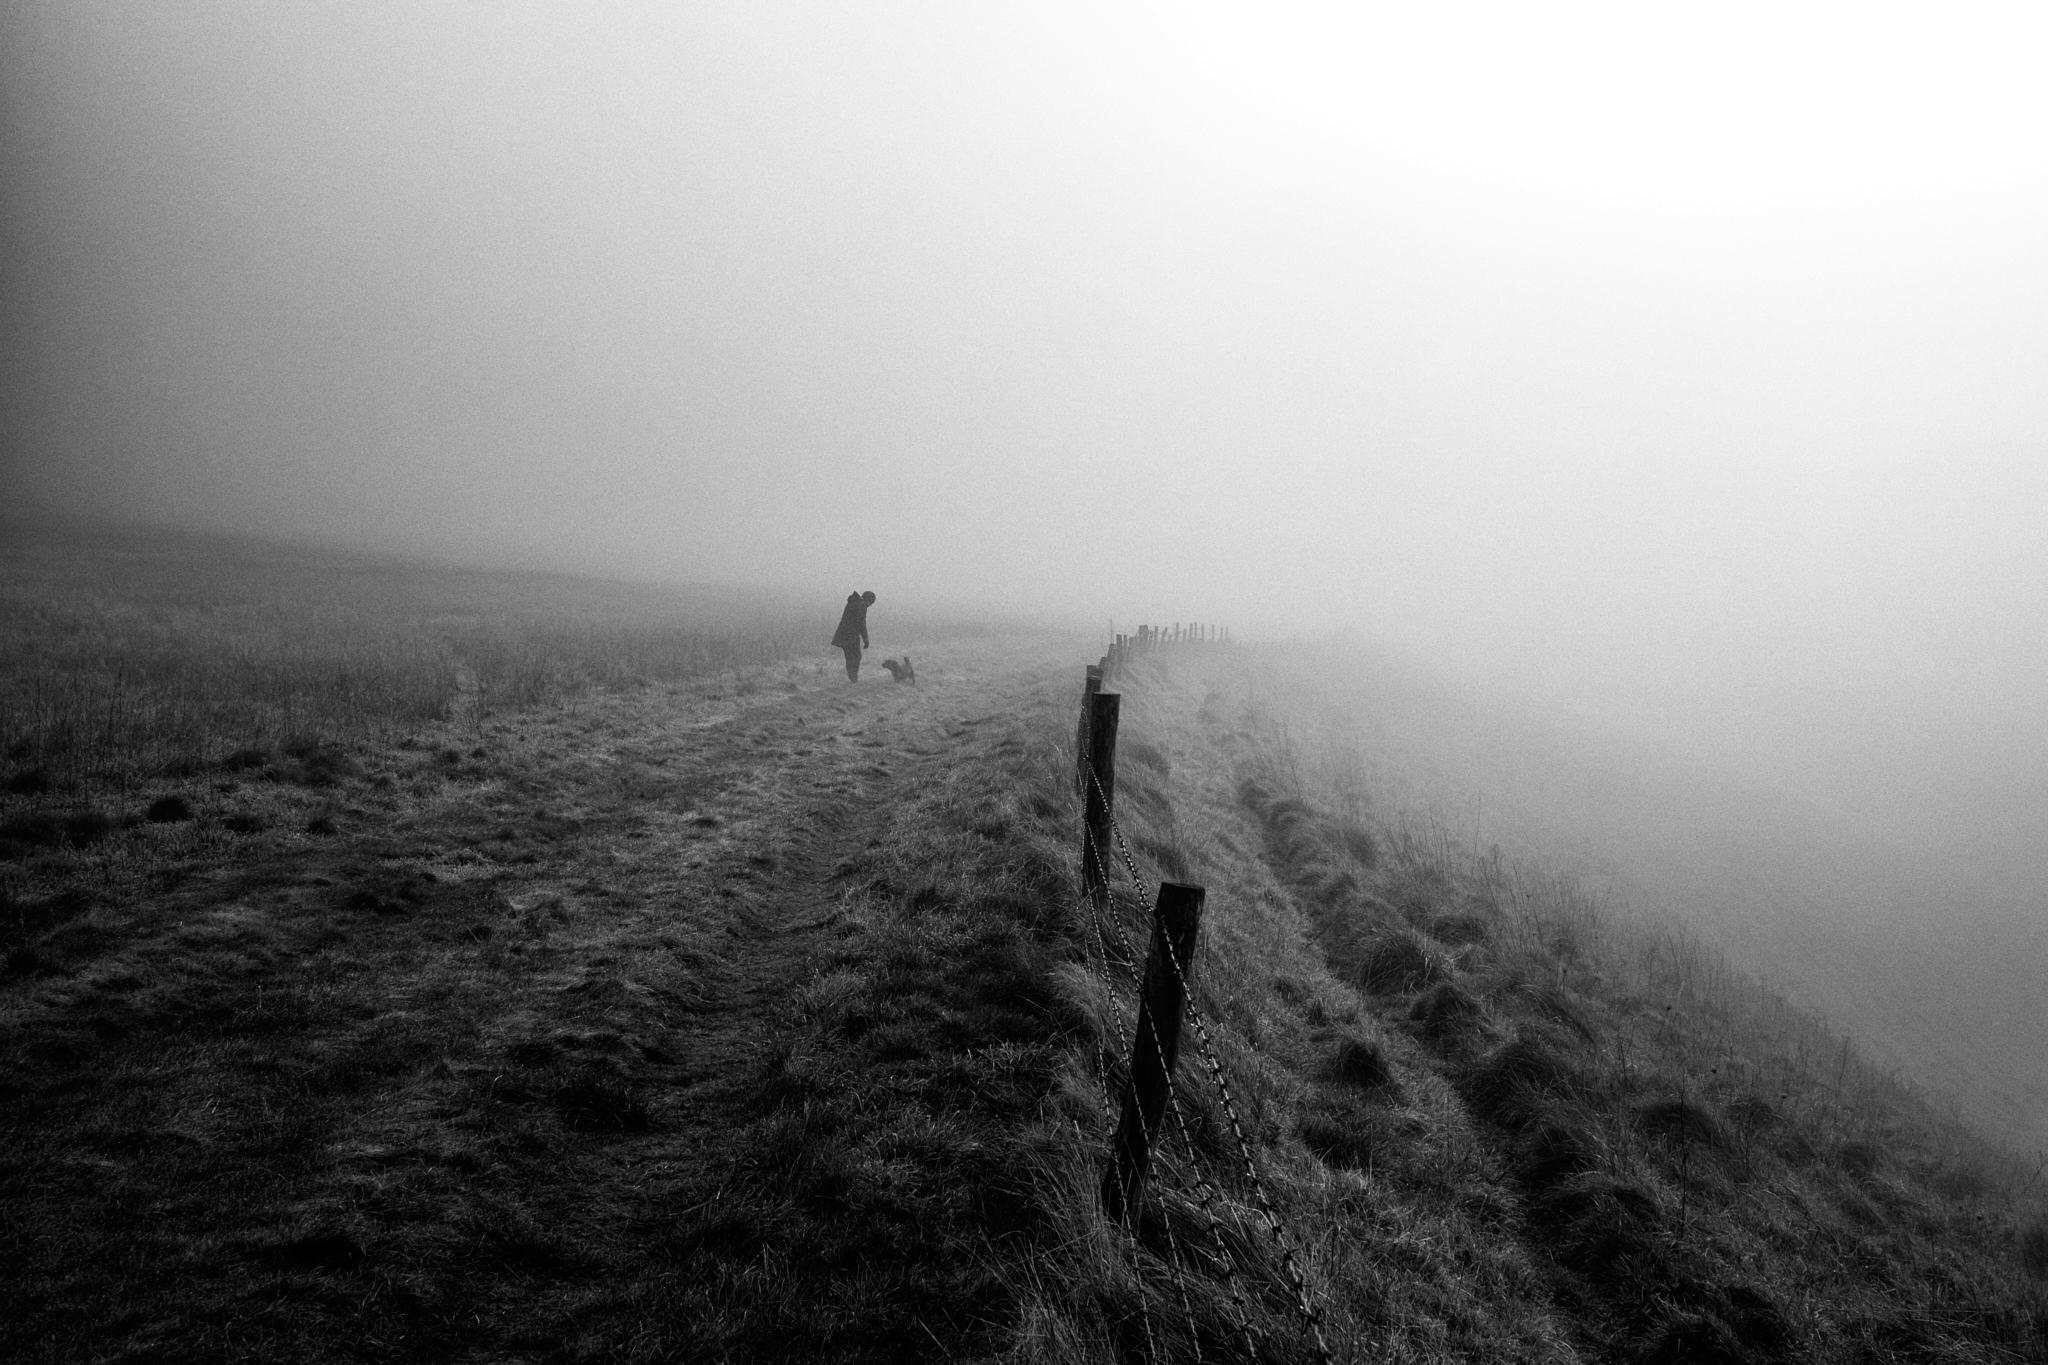 Oscar in the early morning mist